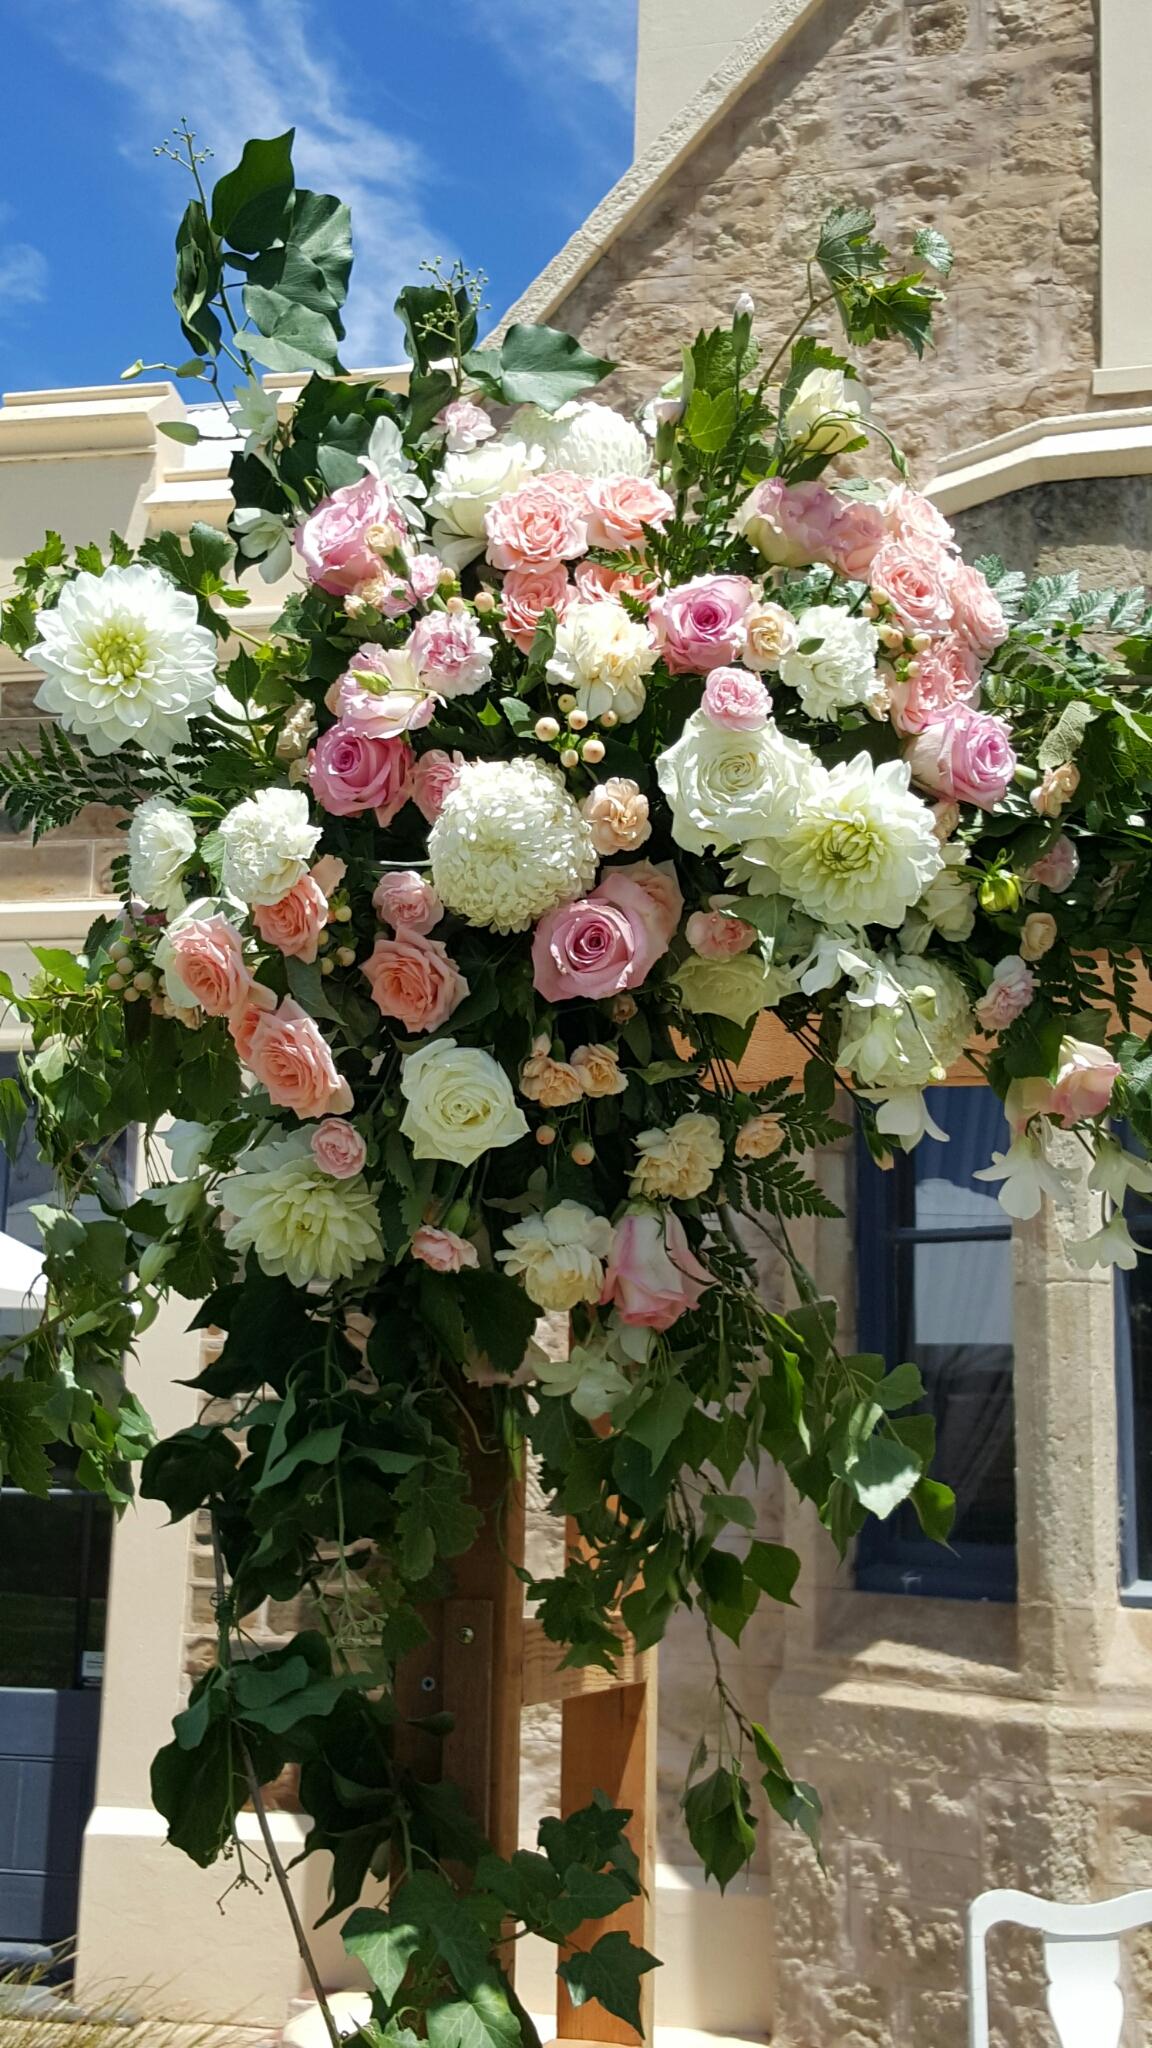 Arbour Flowers Flowers Of Envy